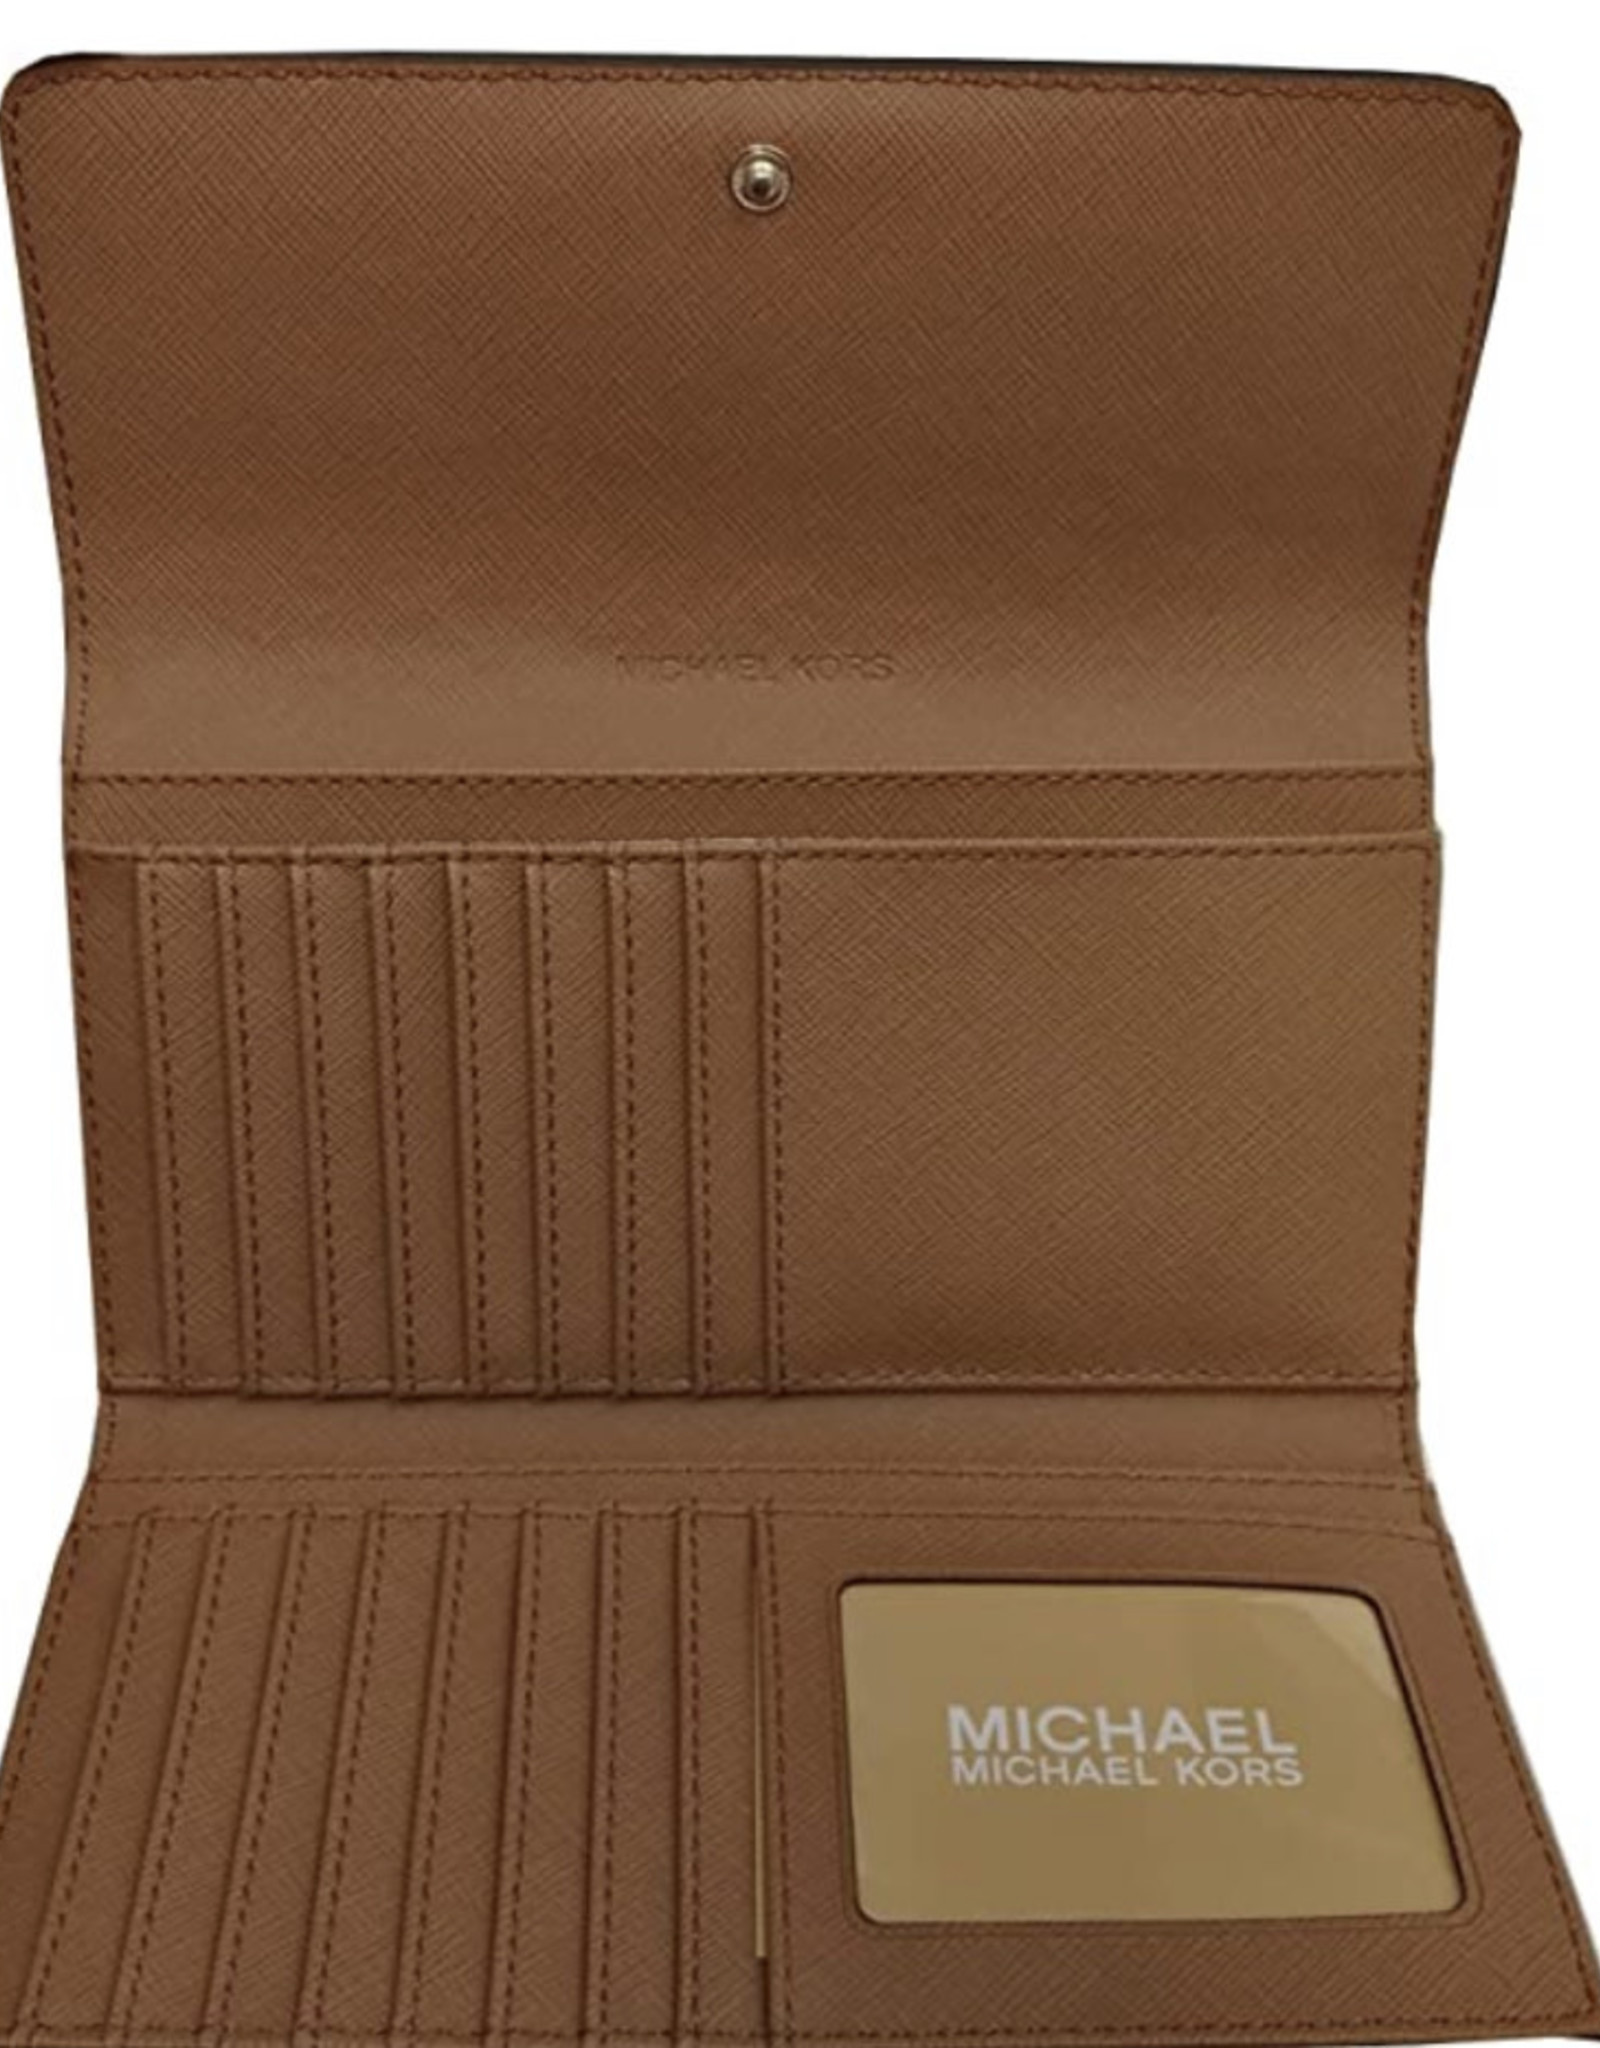 Michael Kors Michael Kors Trifold Wallet Jet Set Travel